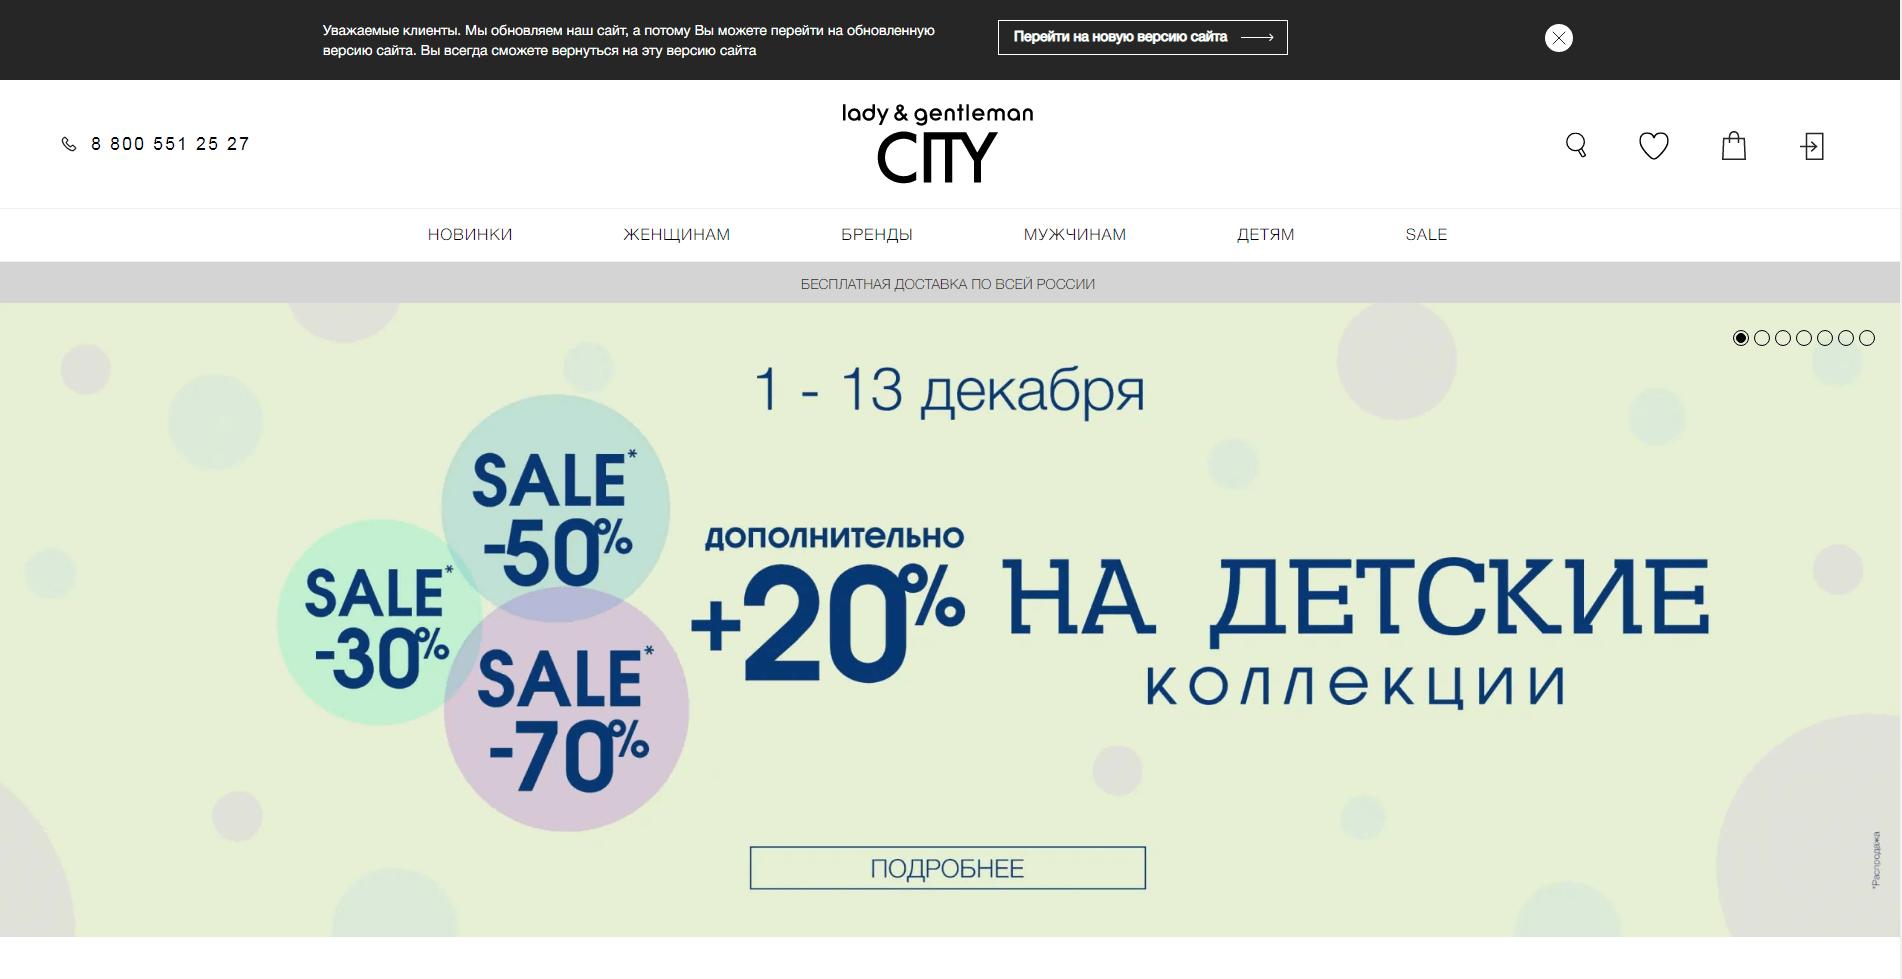 lgcity.ru website